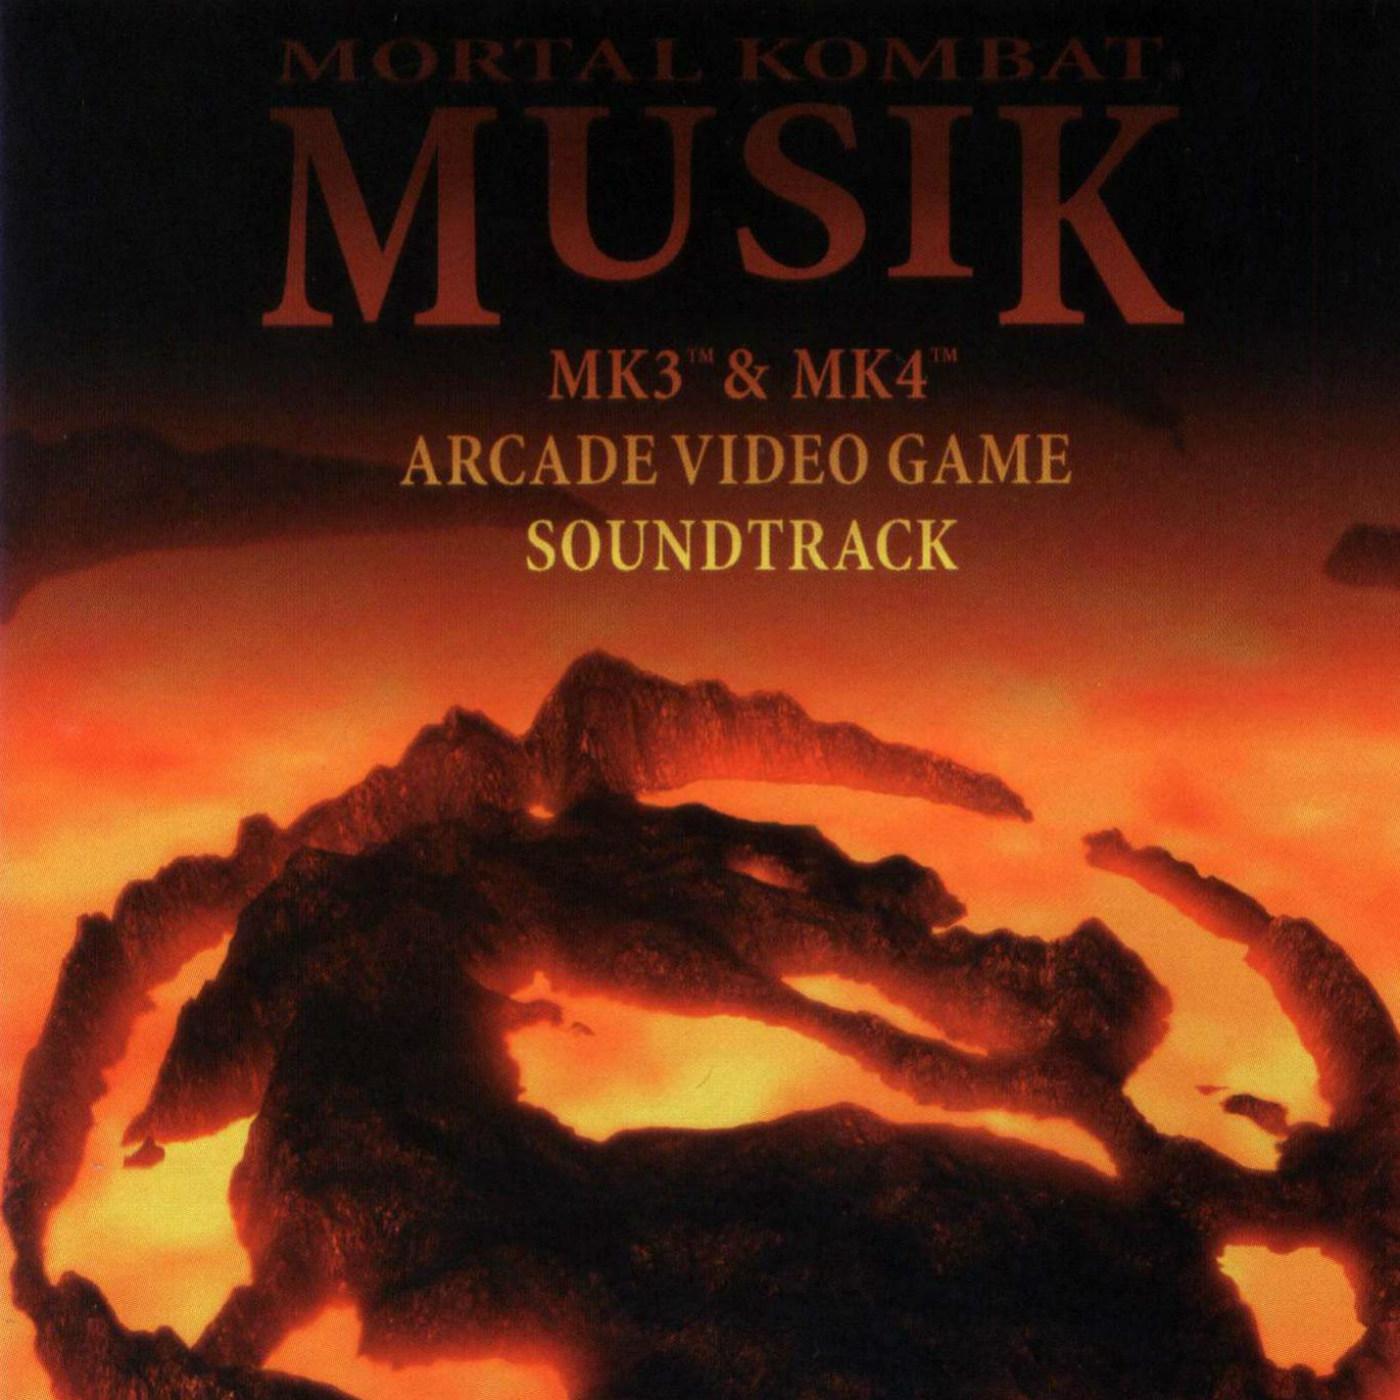 Mortal_Kombat_Musik_MK3__MK4_Arcade_Video_Game_Soundtrack__cover1400x1400.jpg